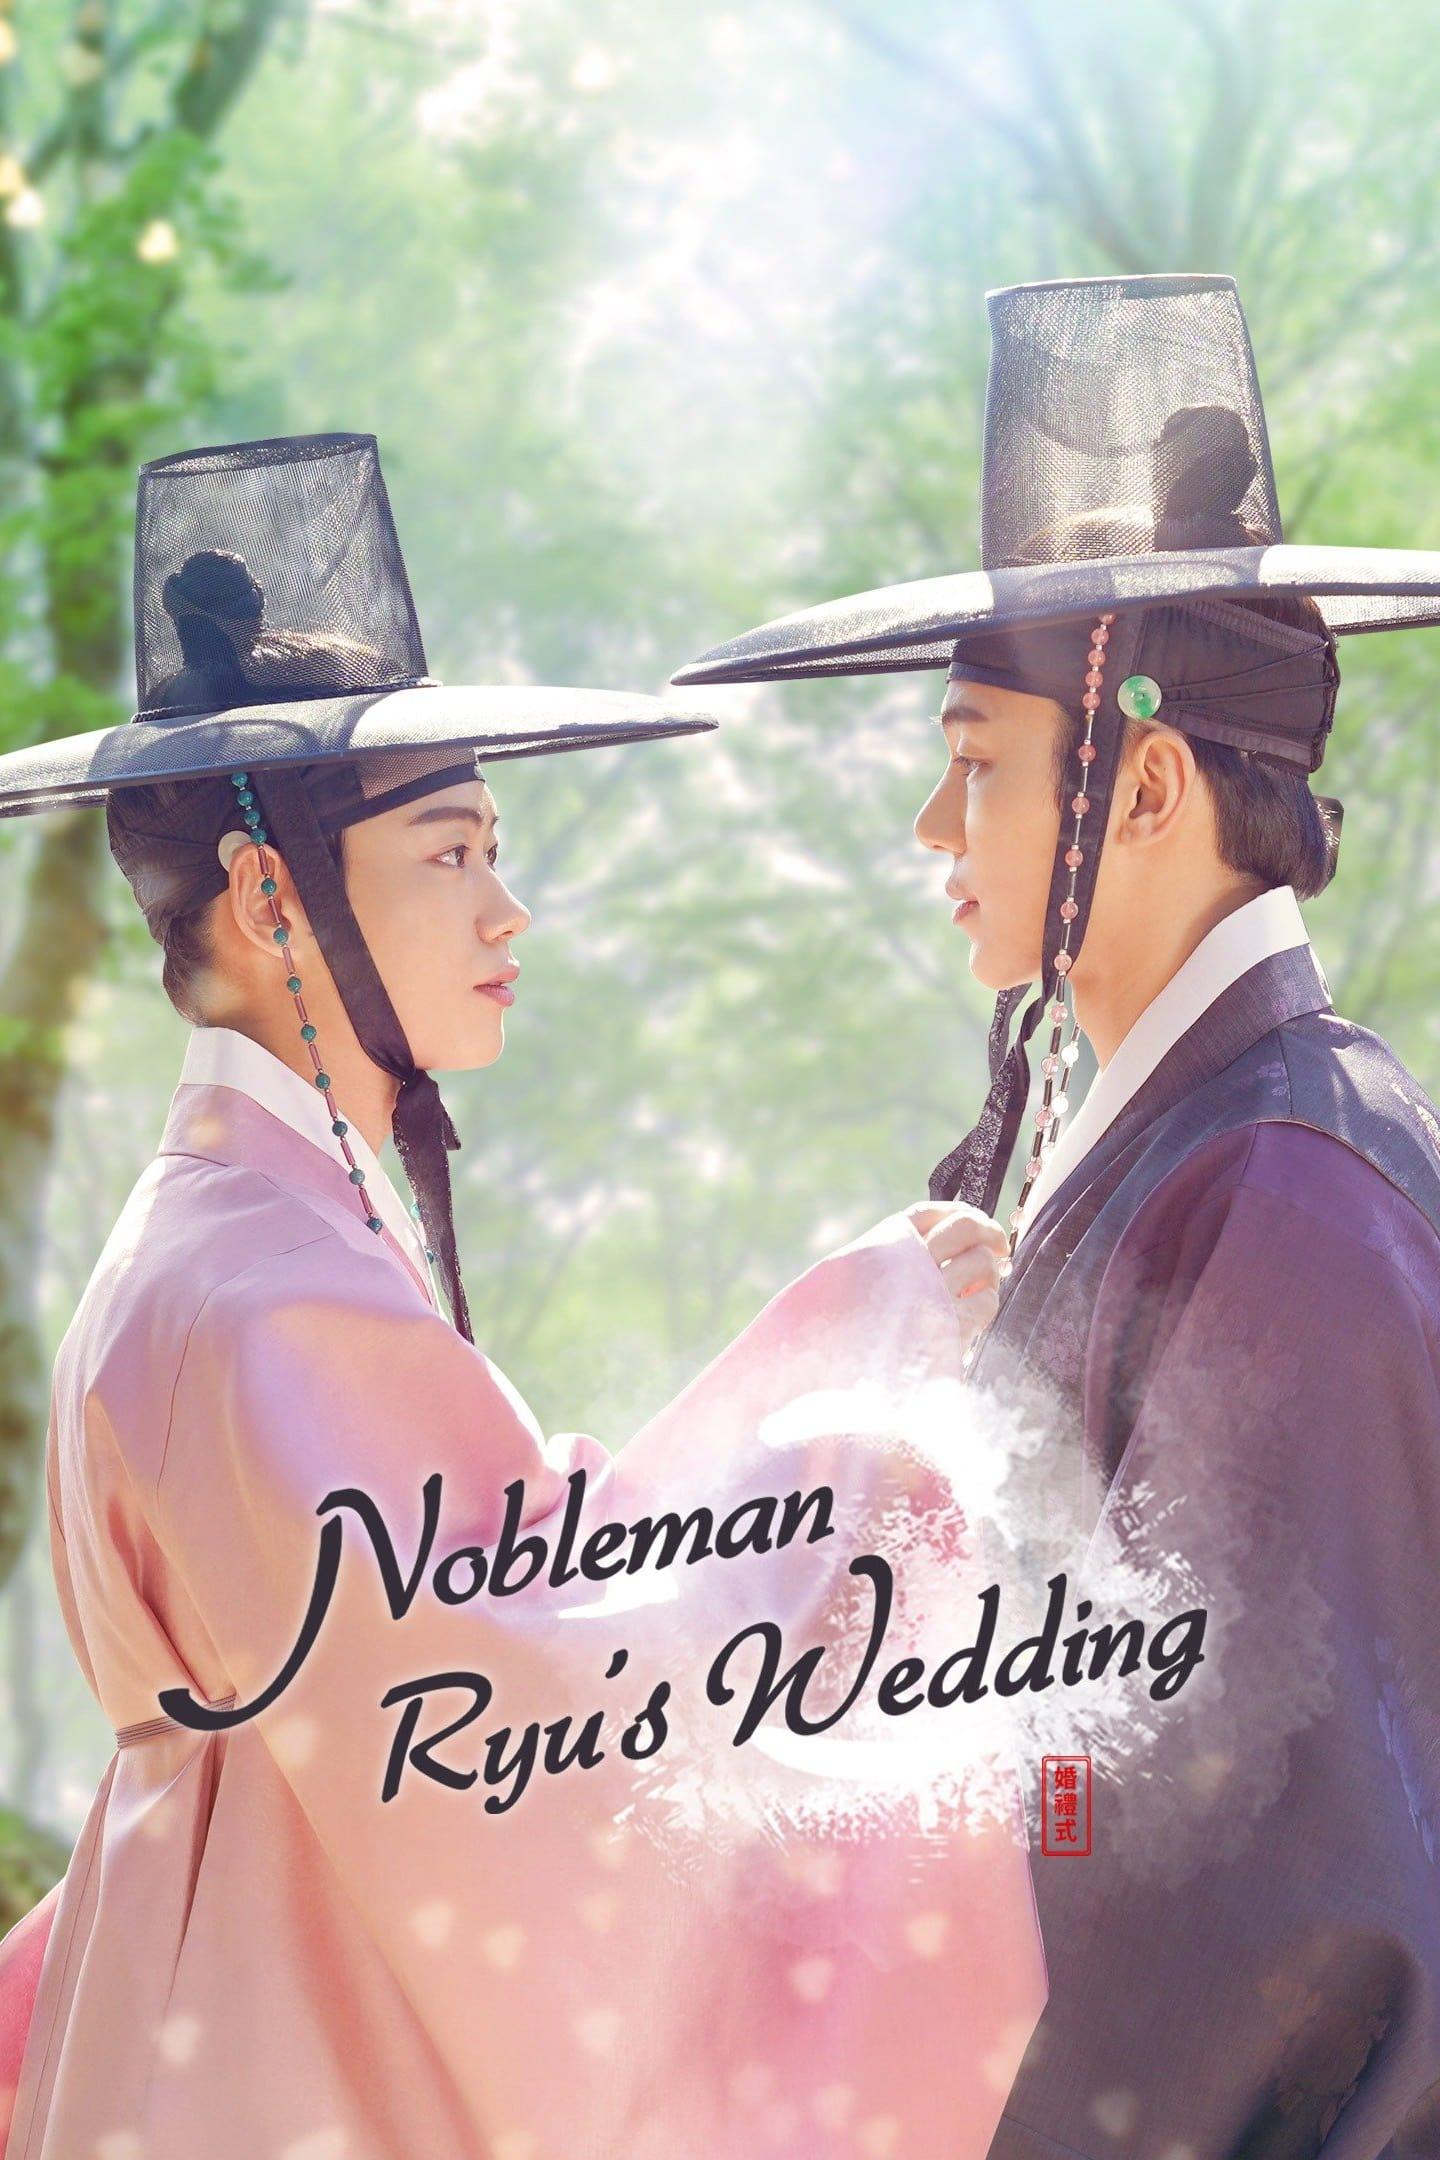 Nobleman Ryu's Wedding